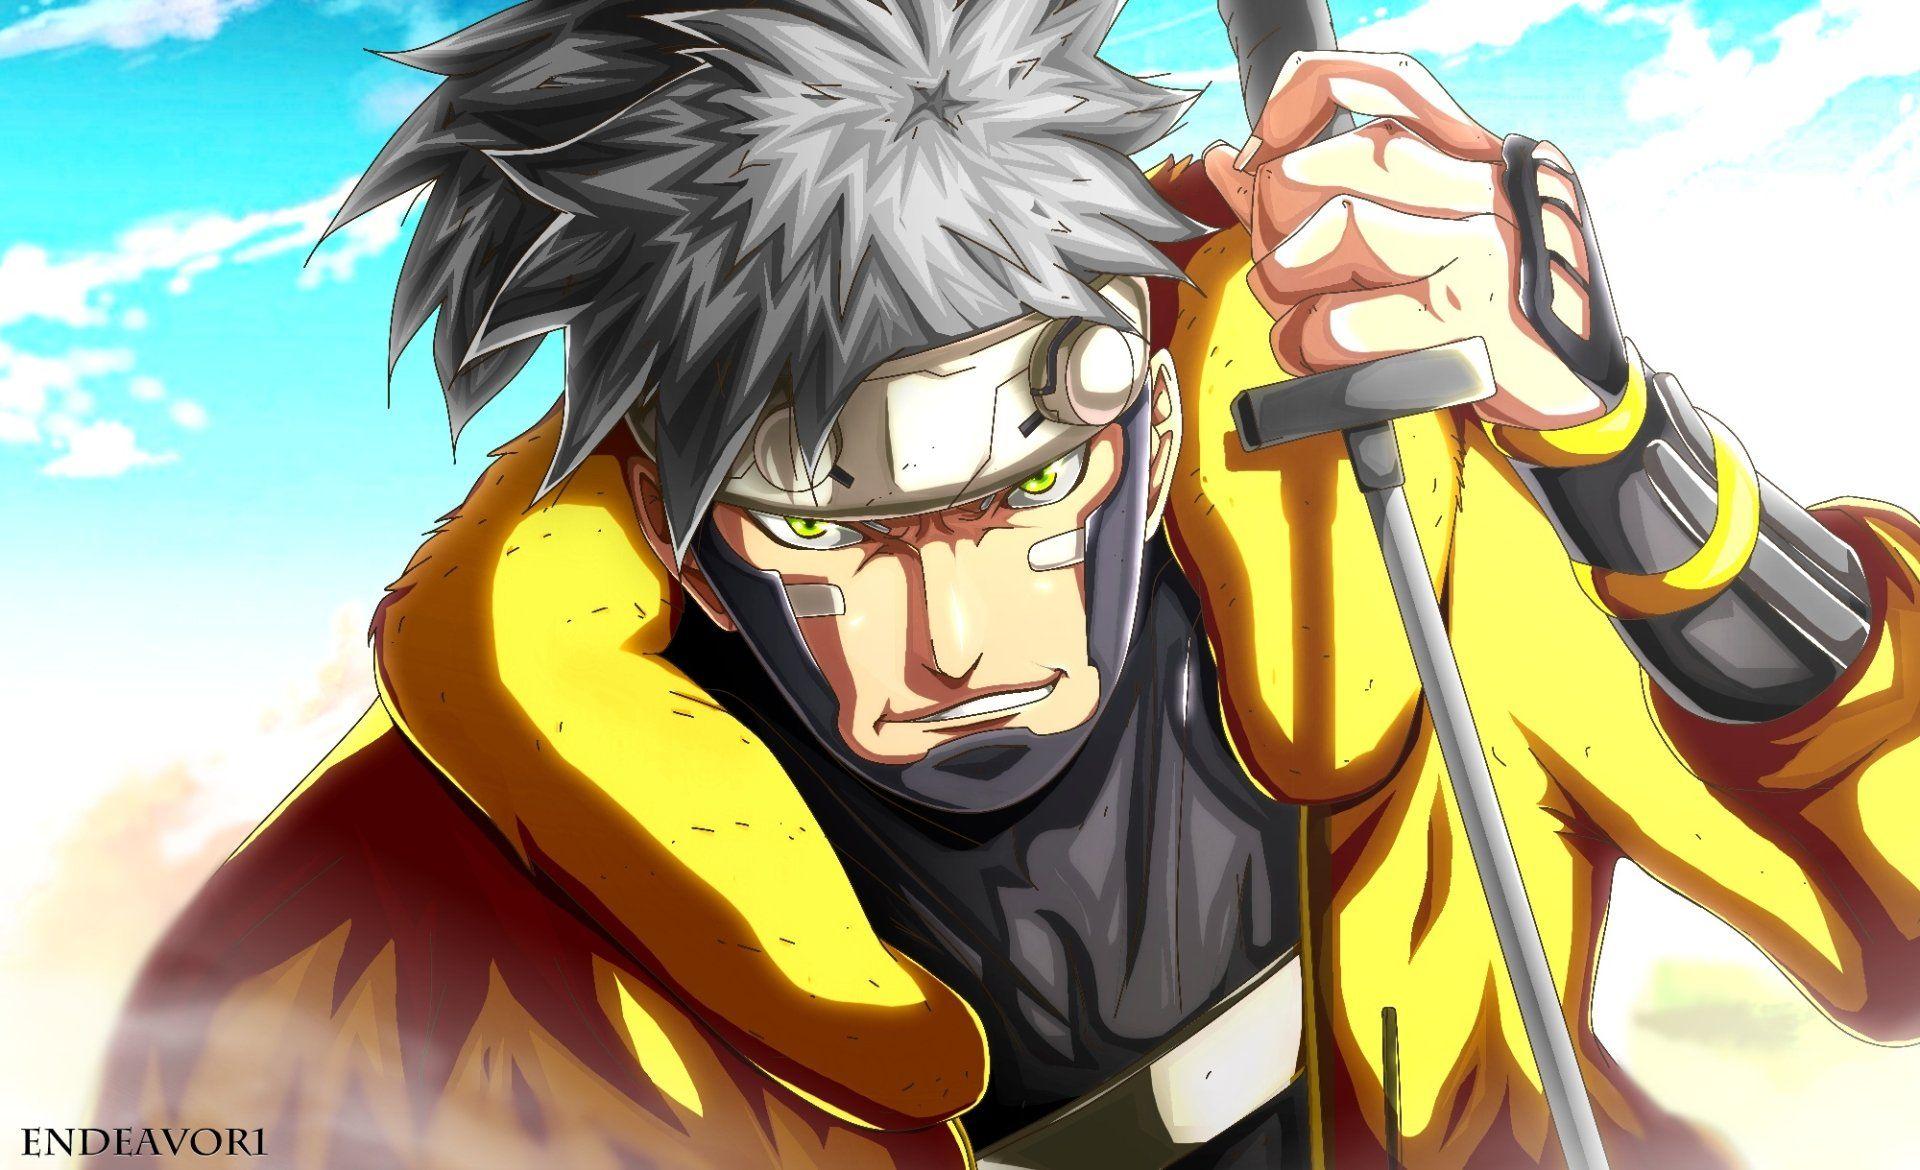 Anime Samurai 8 The Tale of Hachimaru Wallpaper Anime